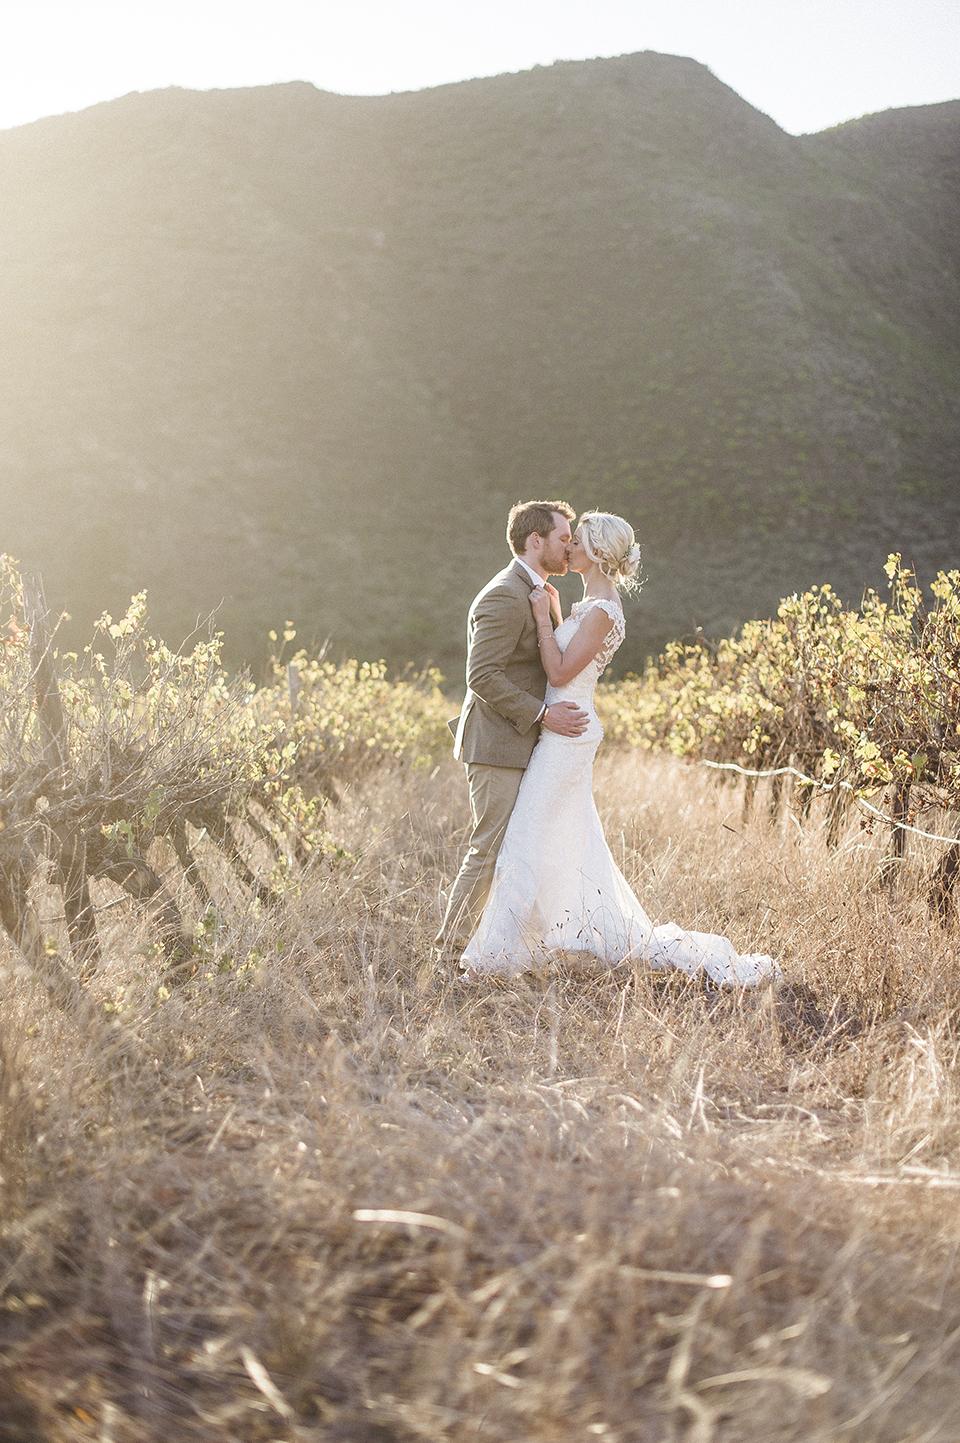 RyanParker_WeddingPhotographer_FineArt_CapeTown_Robertson_PatBusch_Hermanus_M&S_DSC_3437.jpg